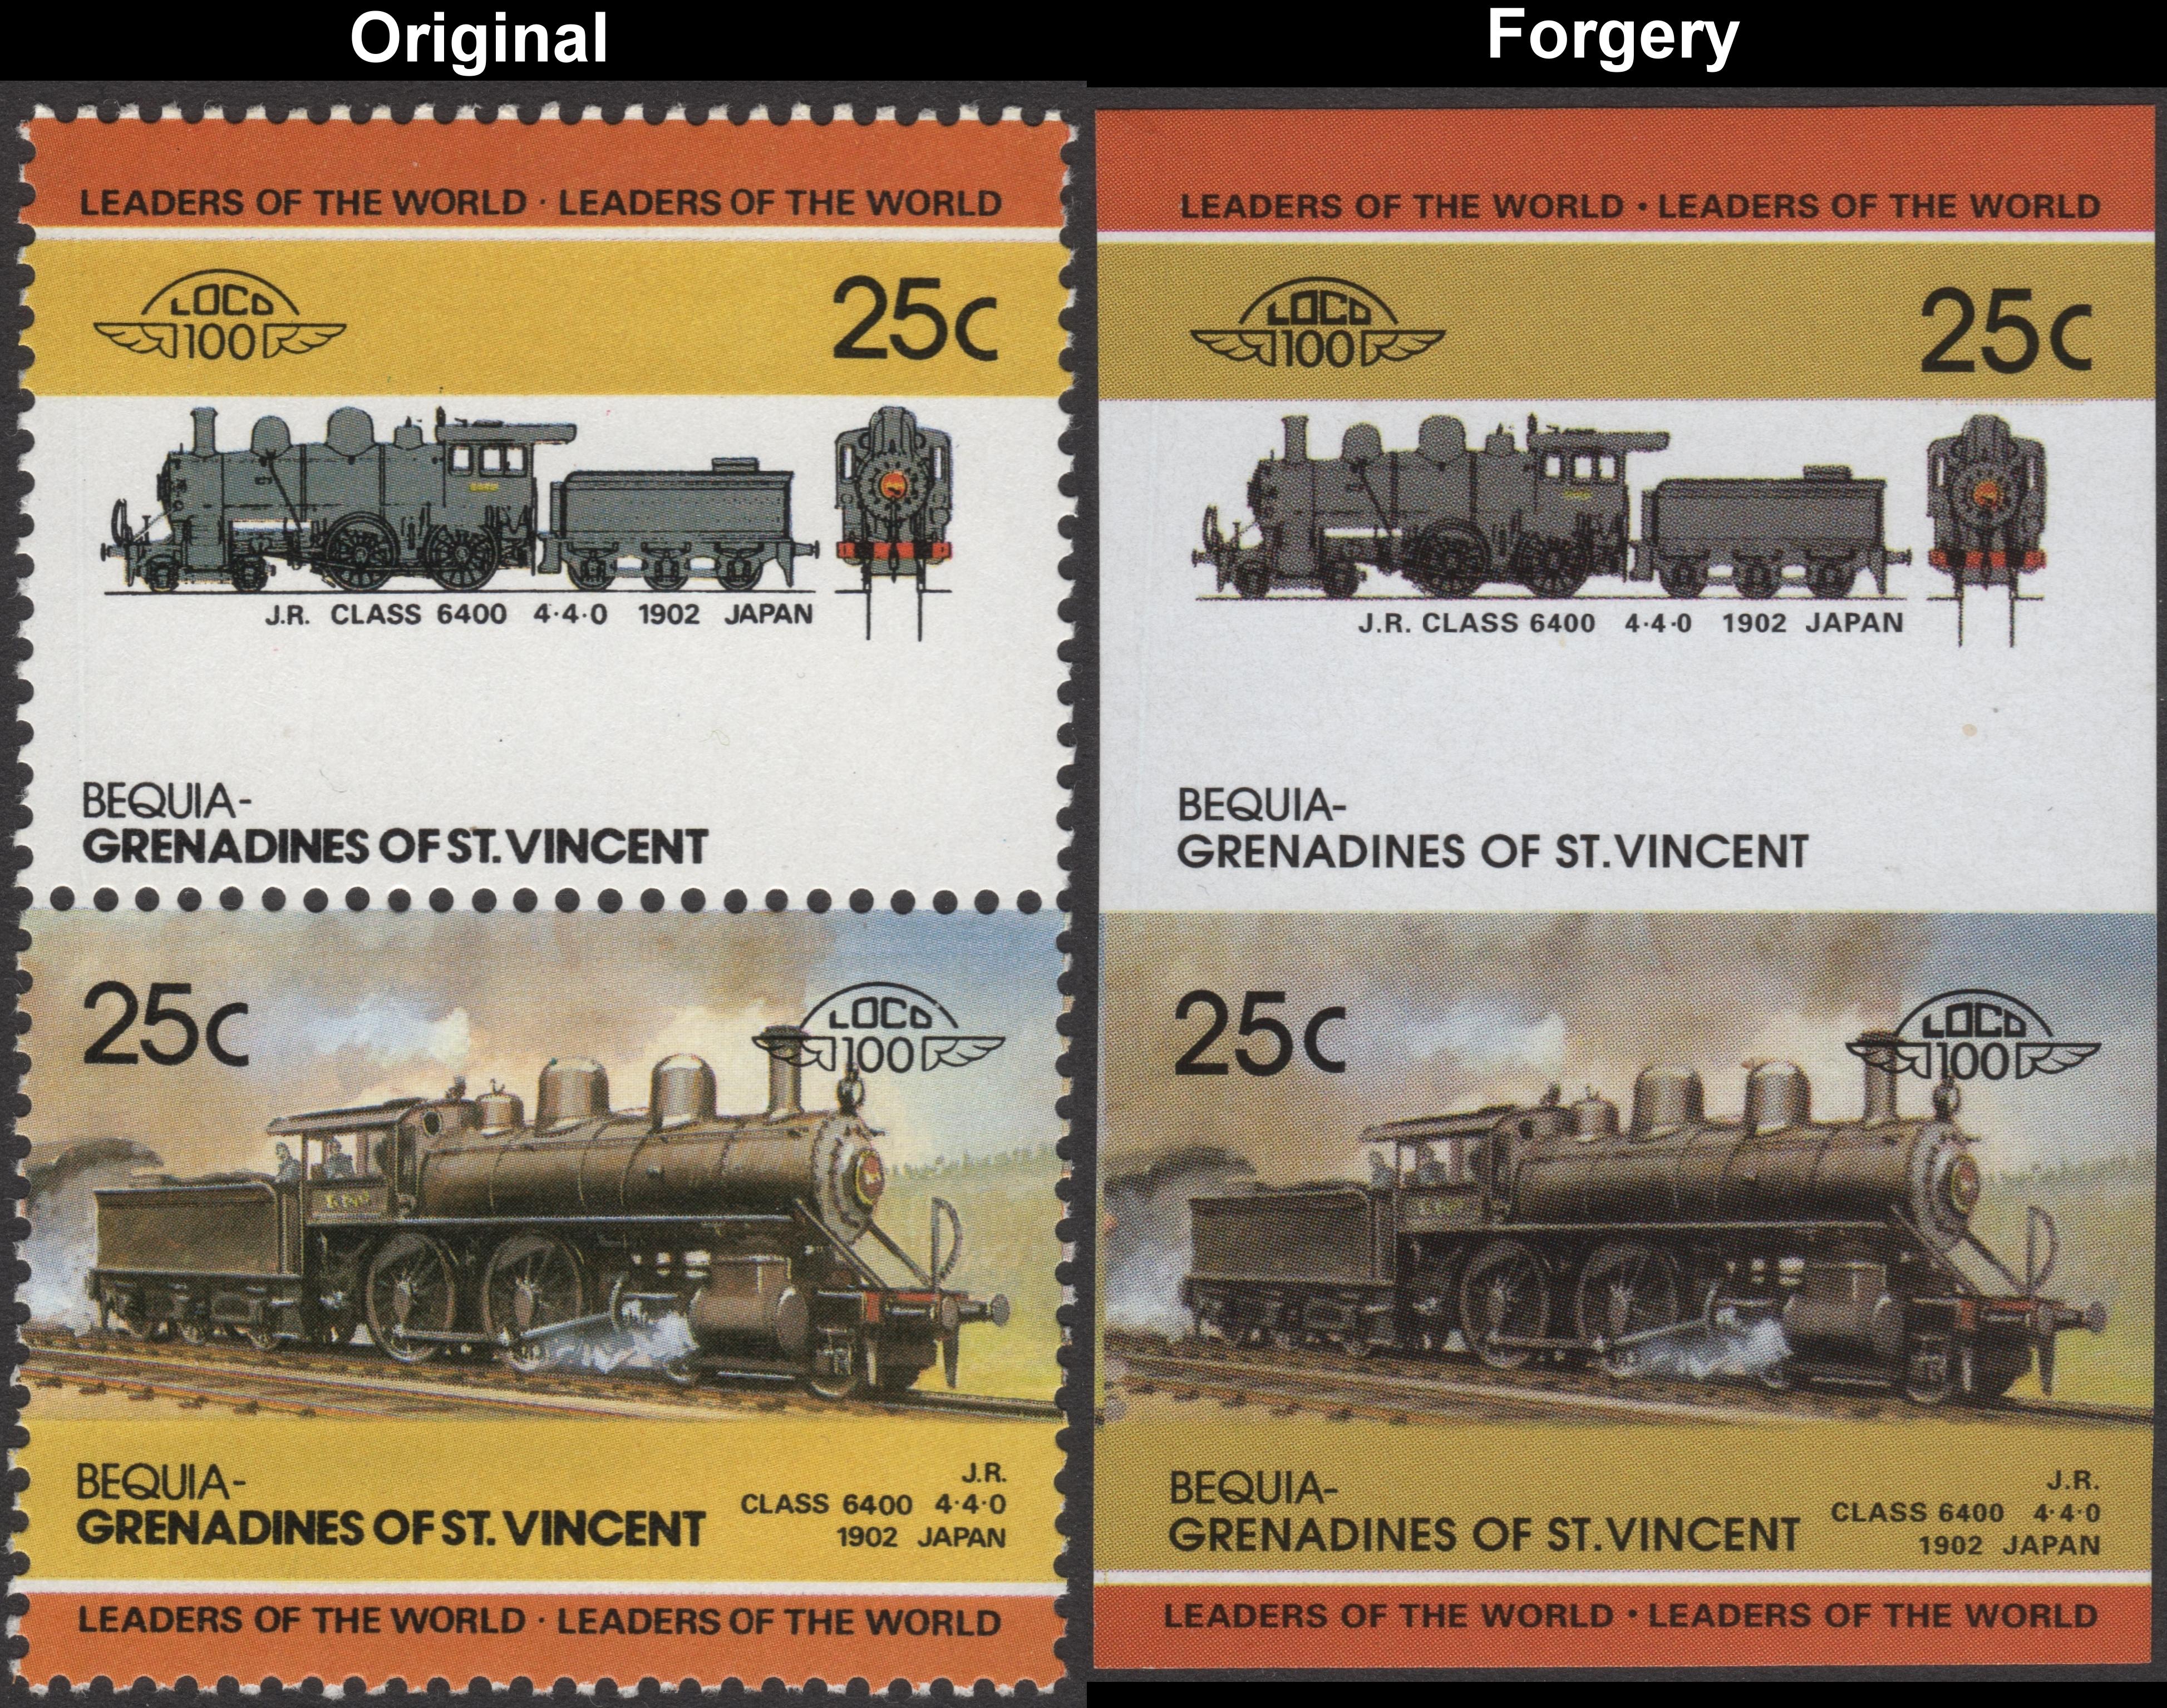 Saint Vincent Bequia 1985 Locomotives 4th Series Stamp Forgeries